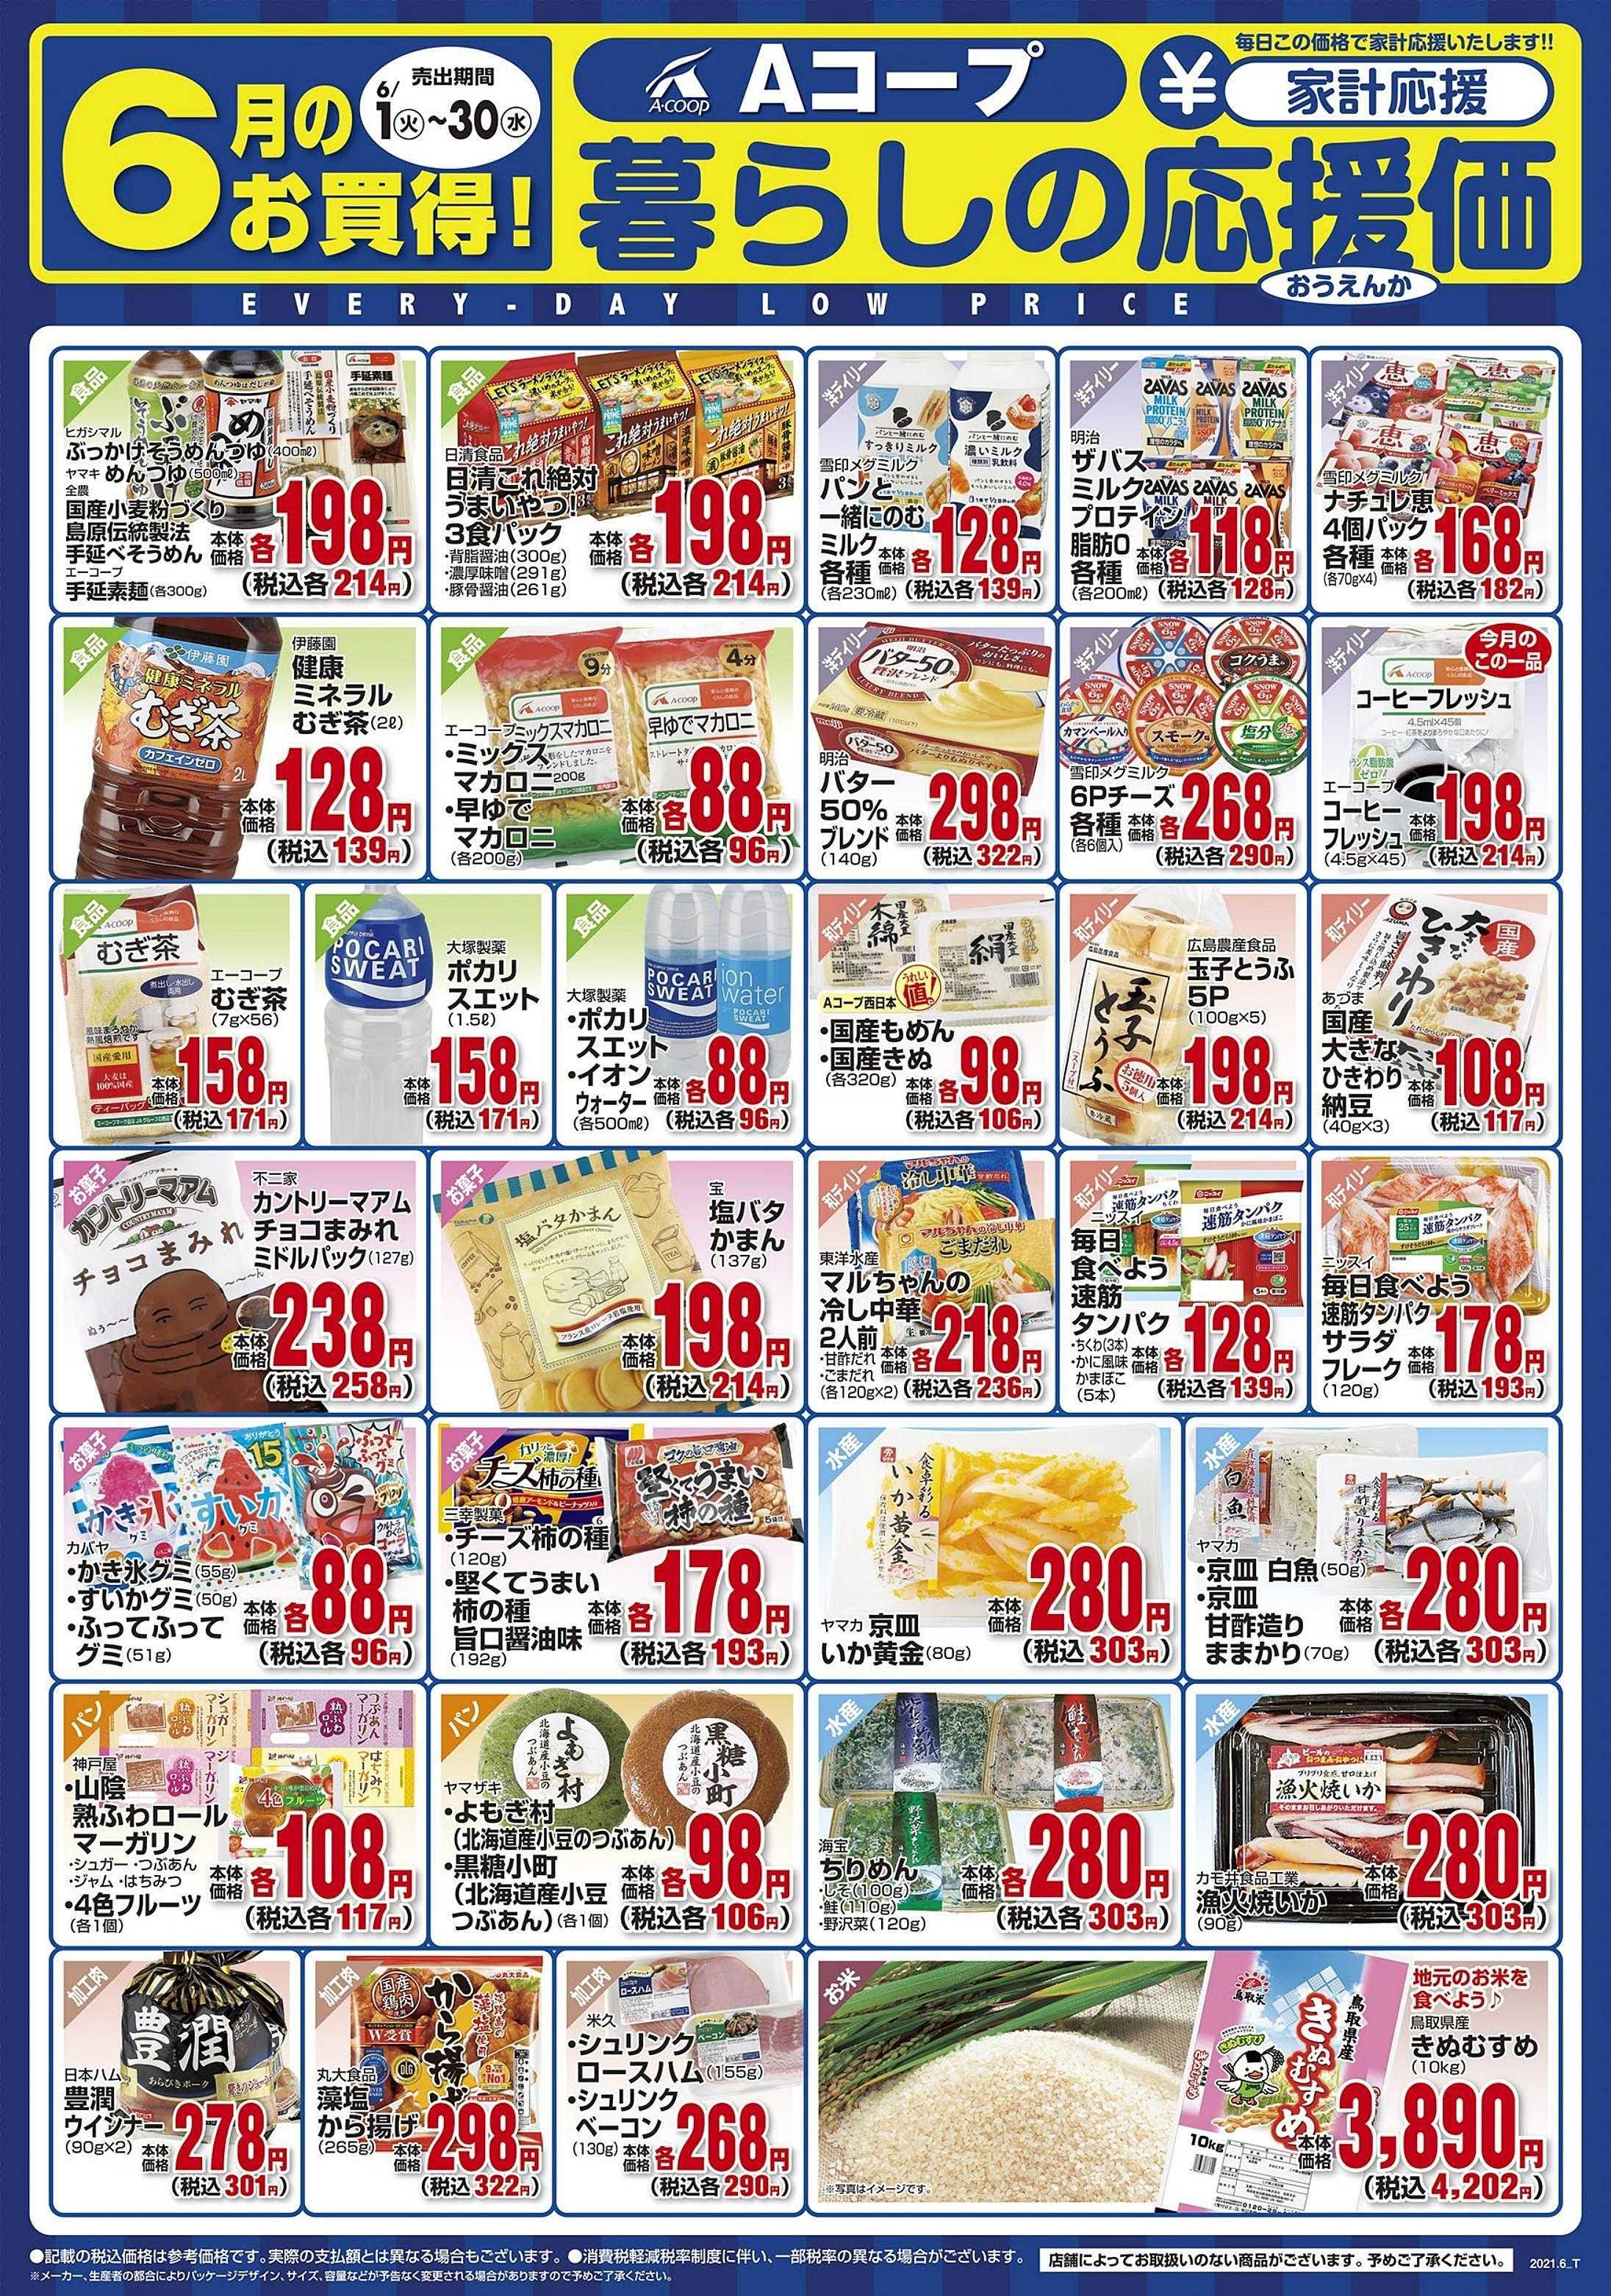 Aコープ西日本 6月「暮らしの応援価」